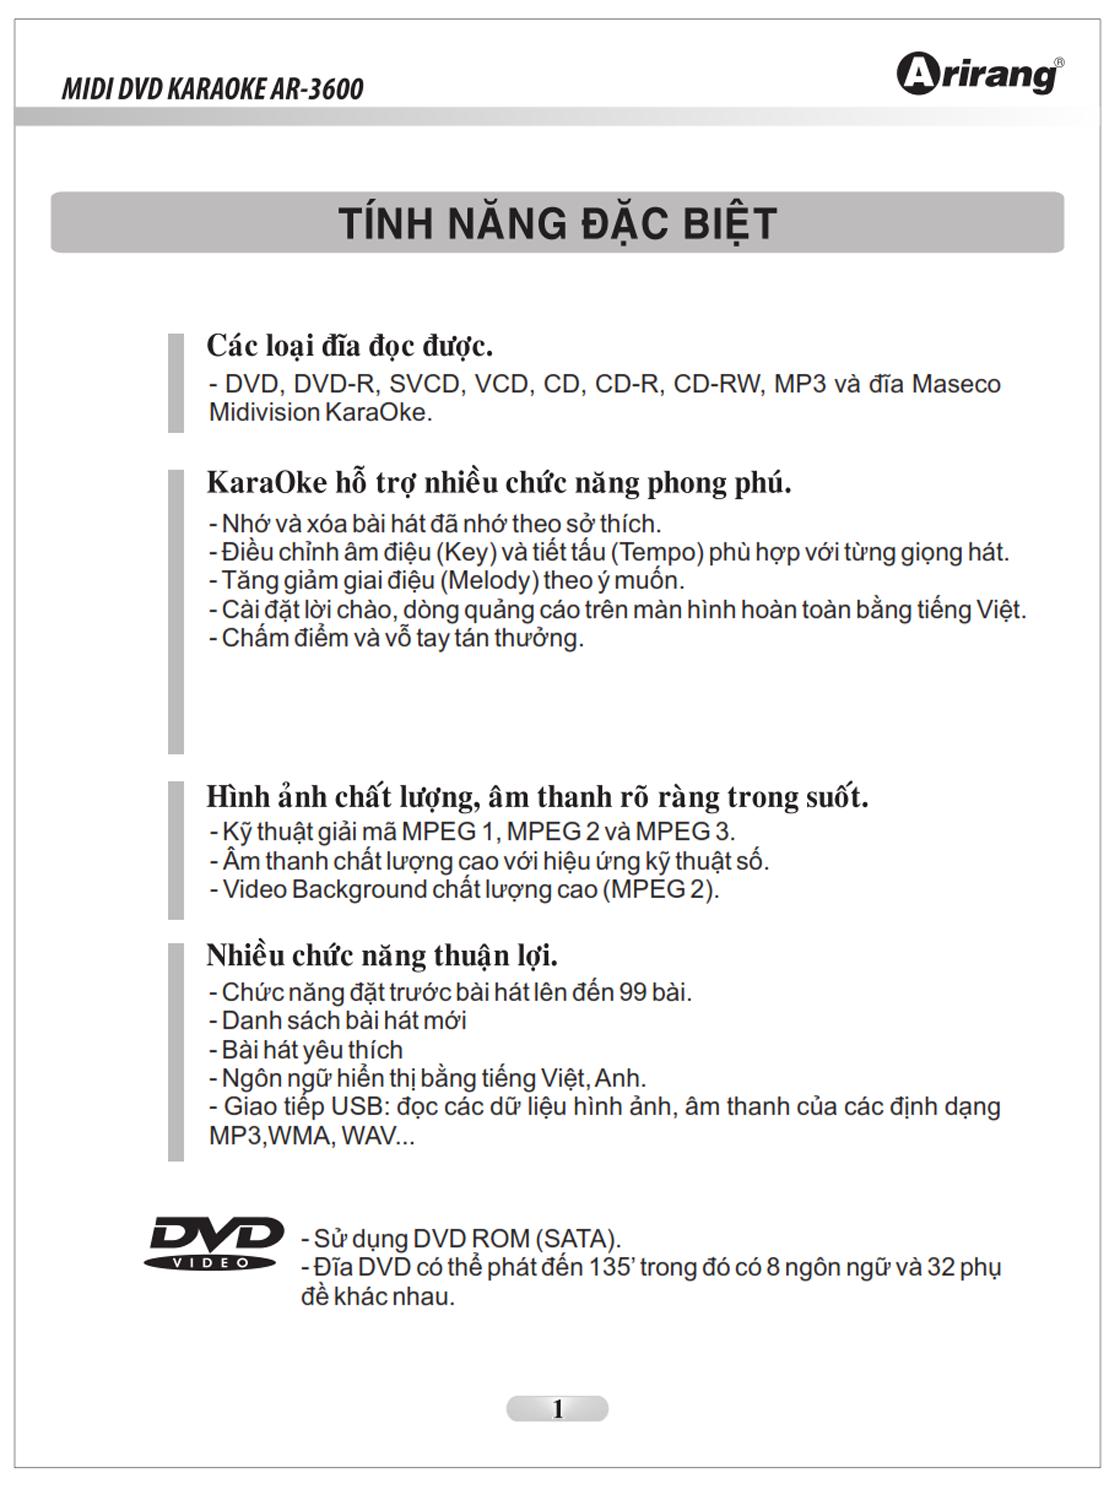 huong-dan-su-dung-amply-karaoke-arirang-AR-3600-vn_002.png